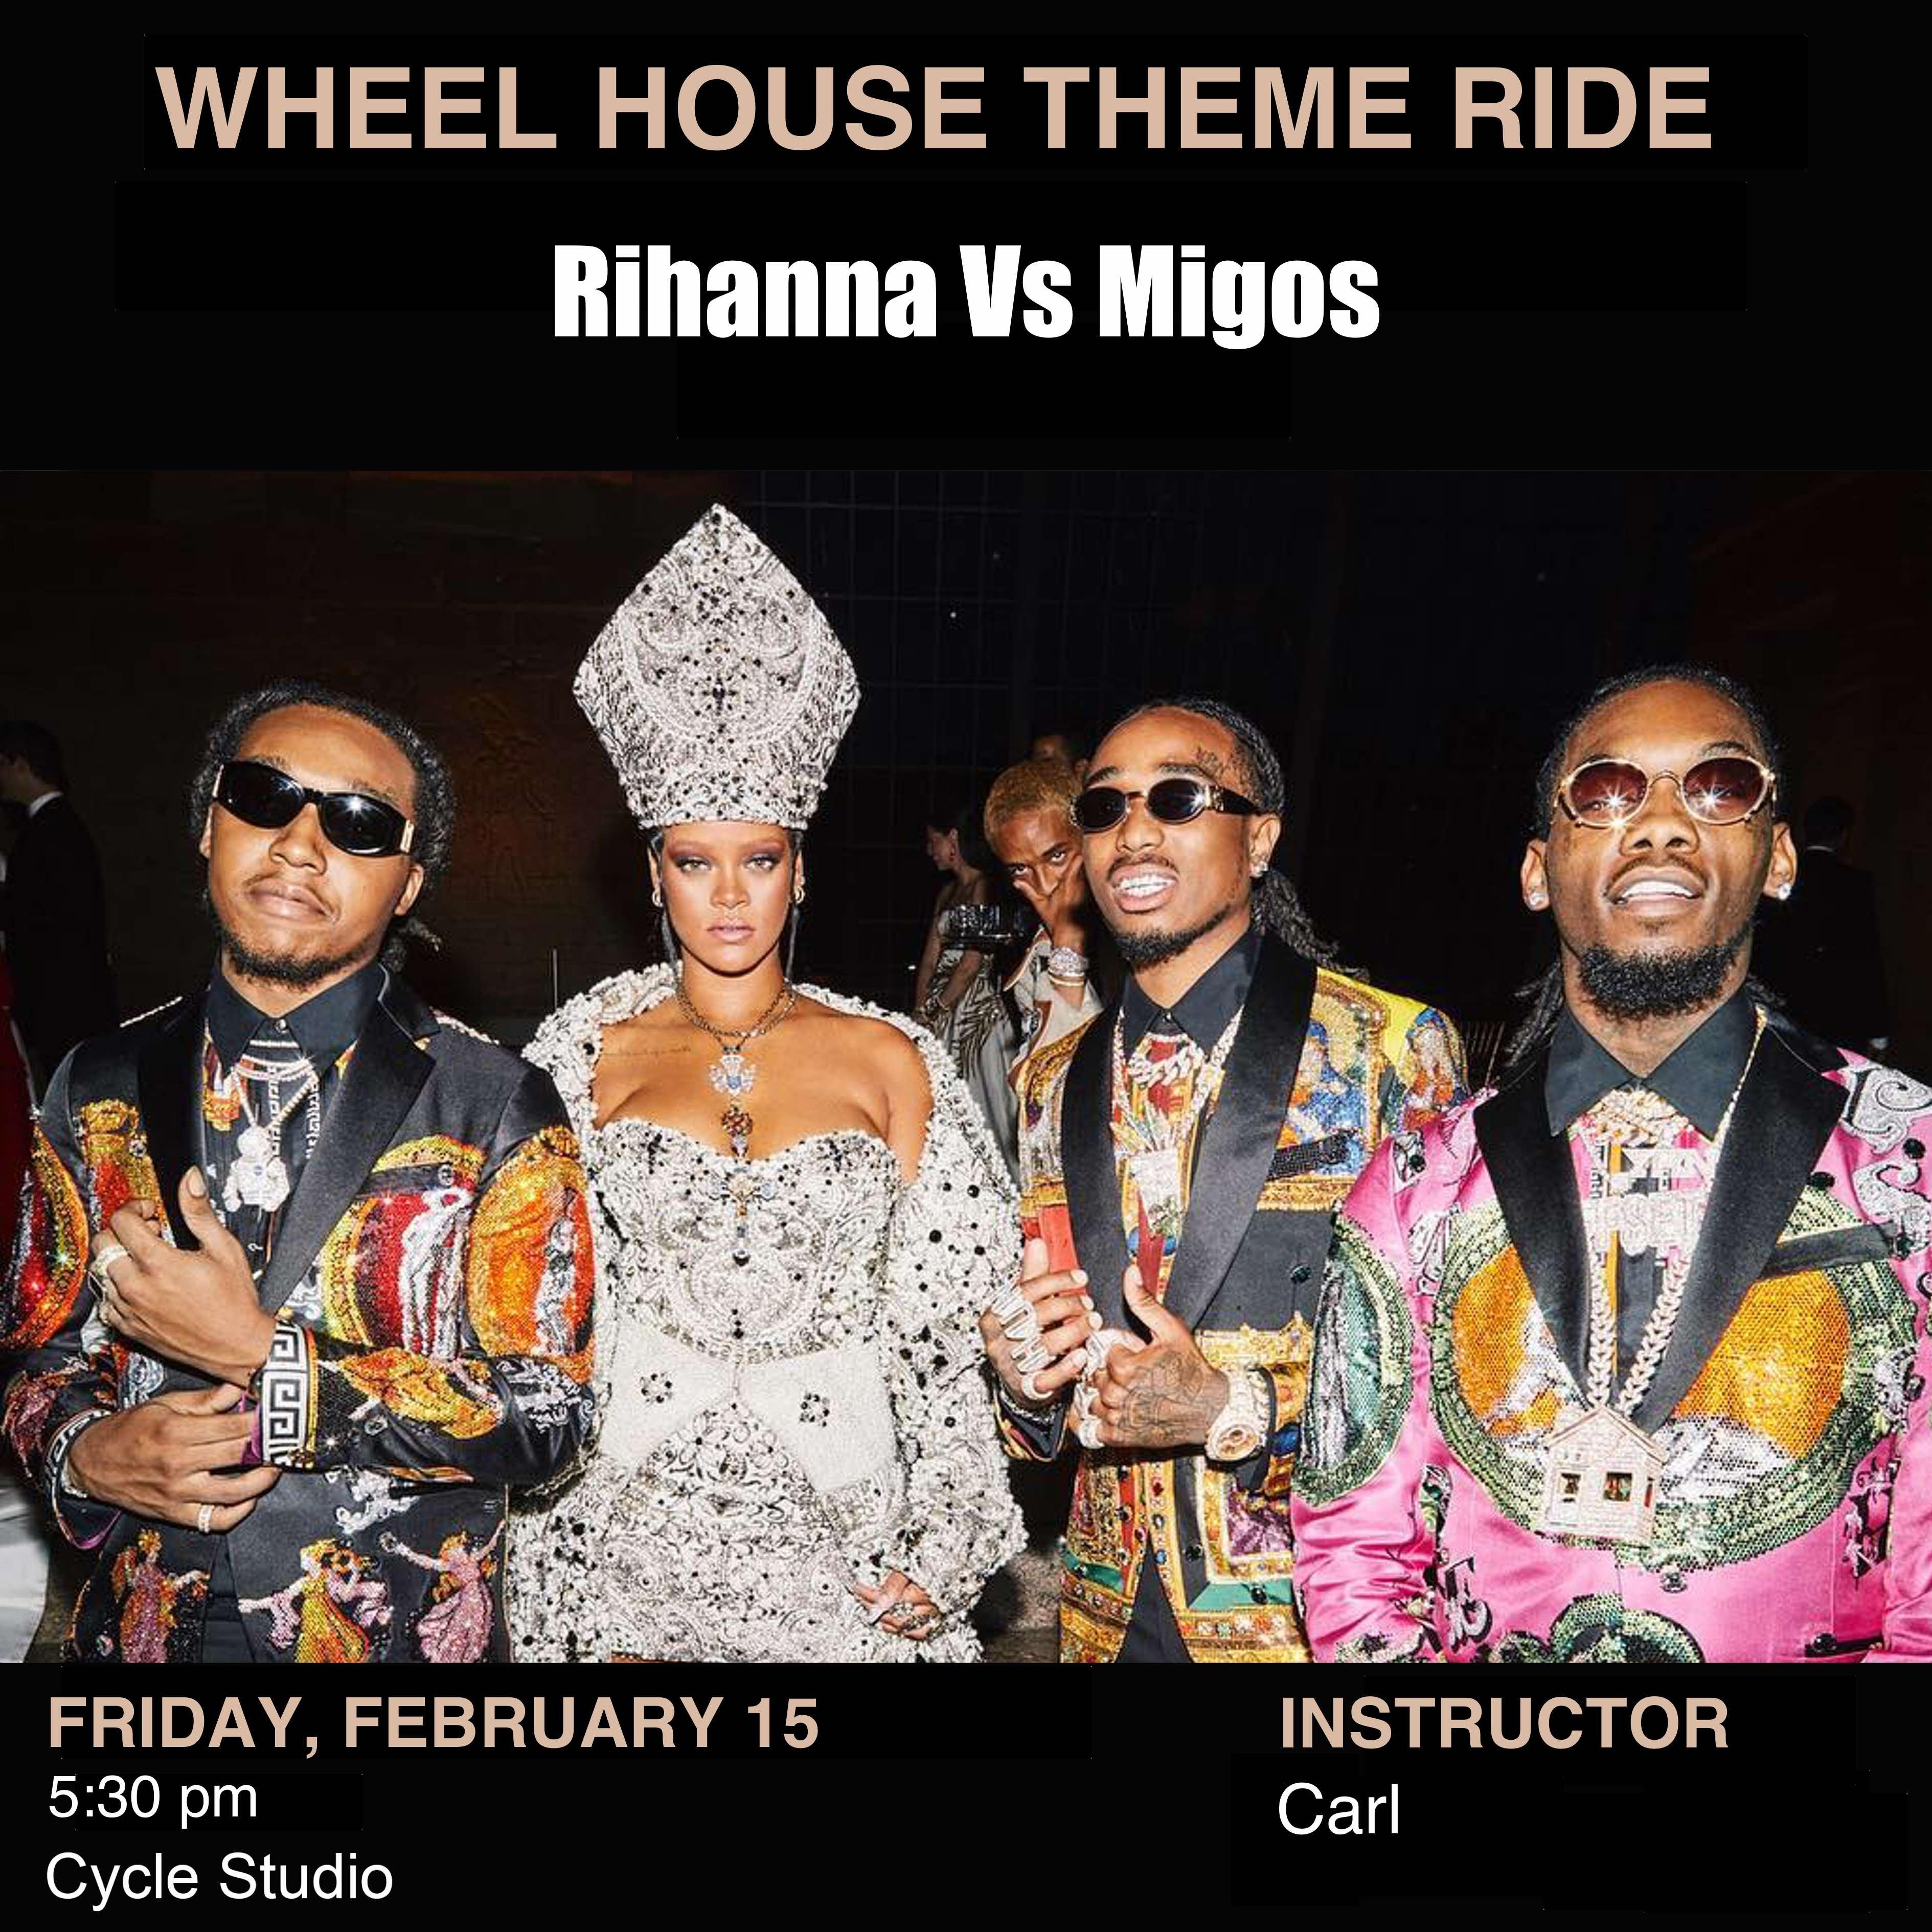 Rihanna vs Migos